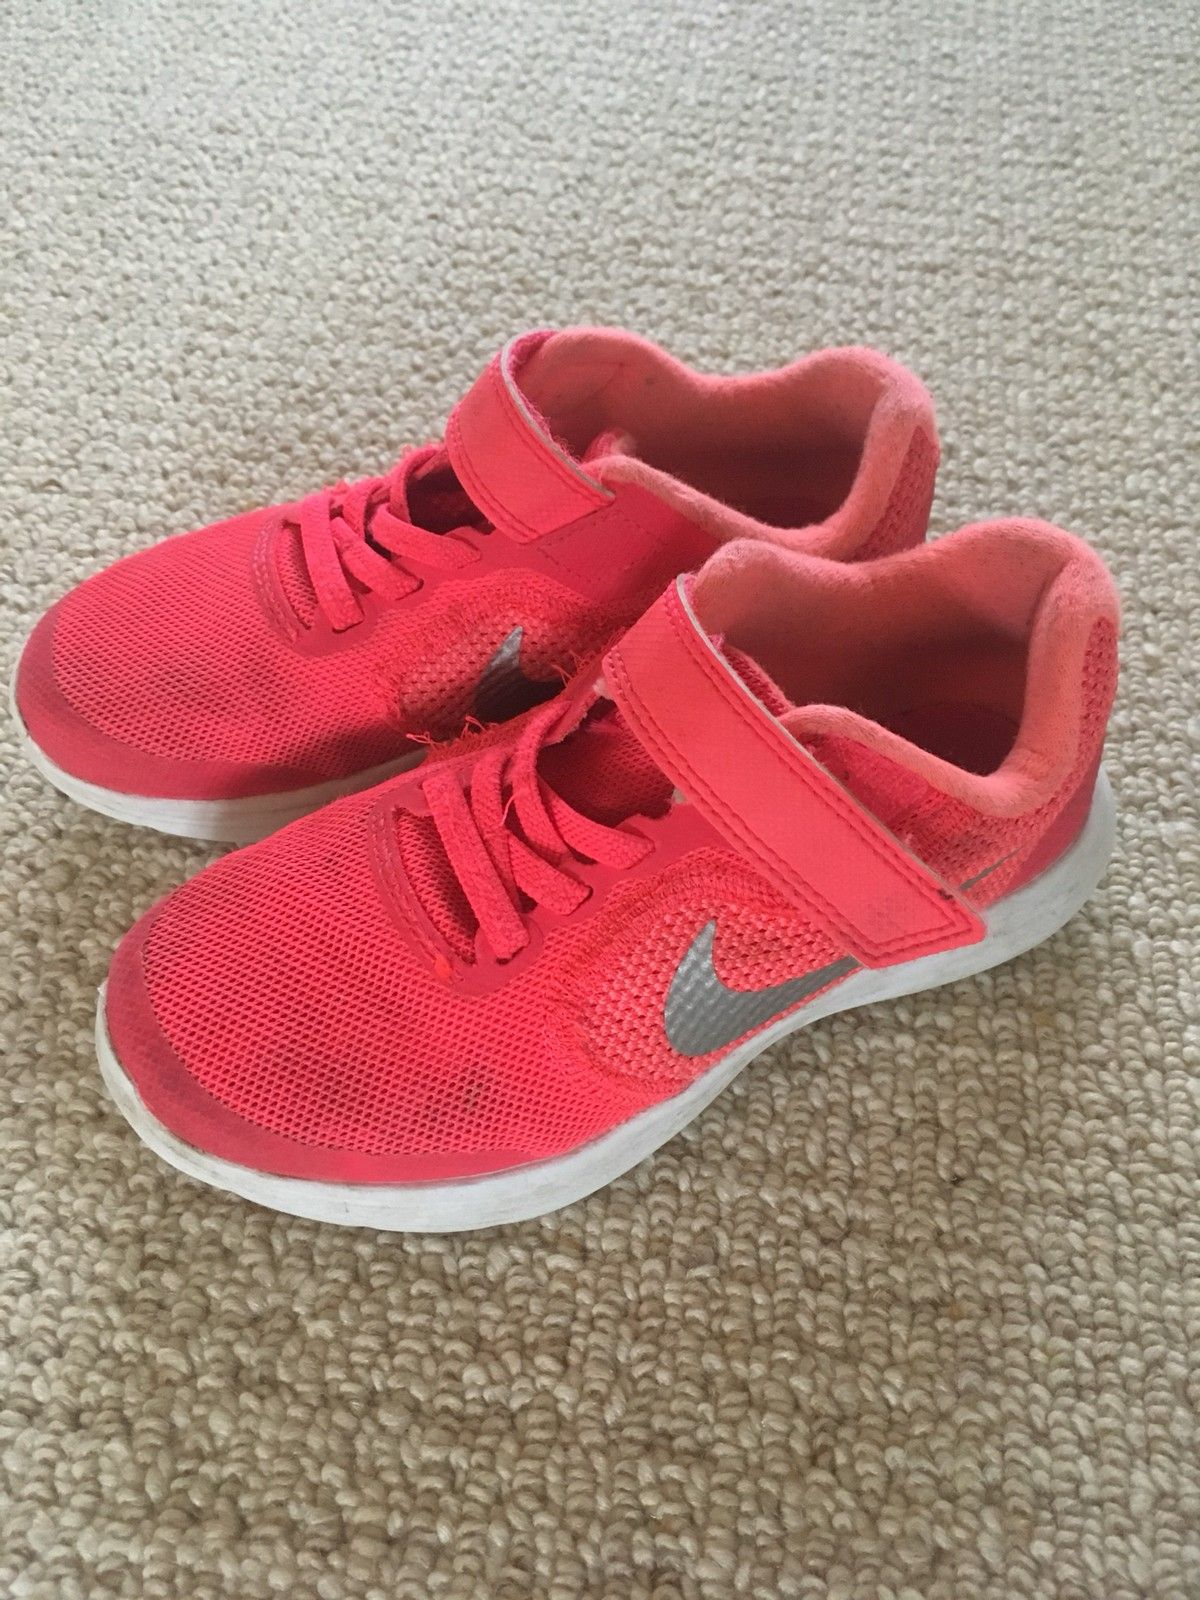 Nike joggesko str. 28,5 | FINN.no